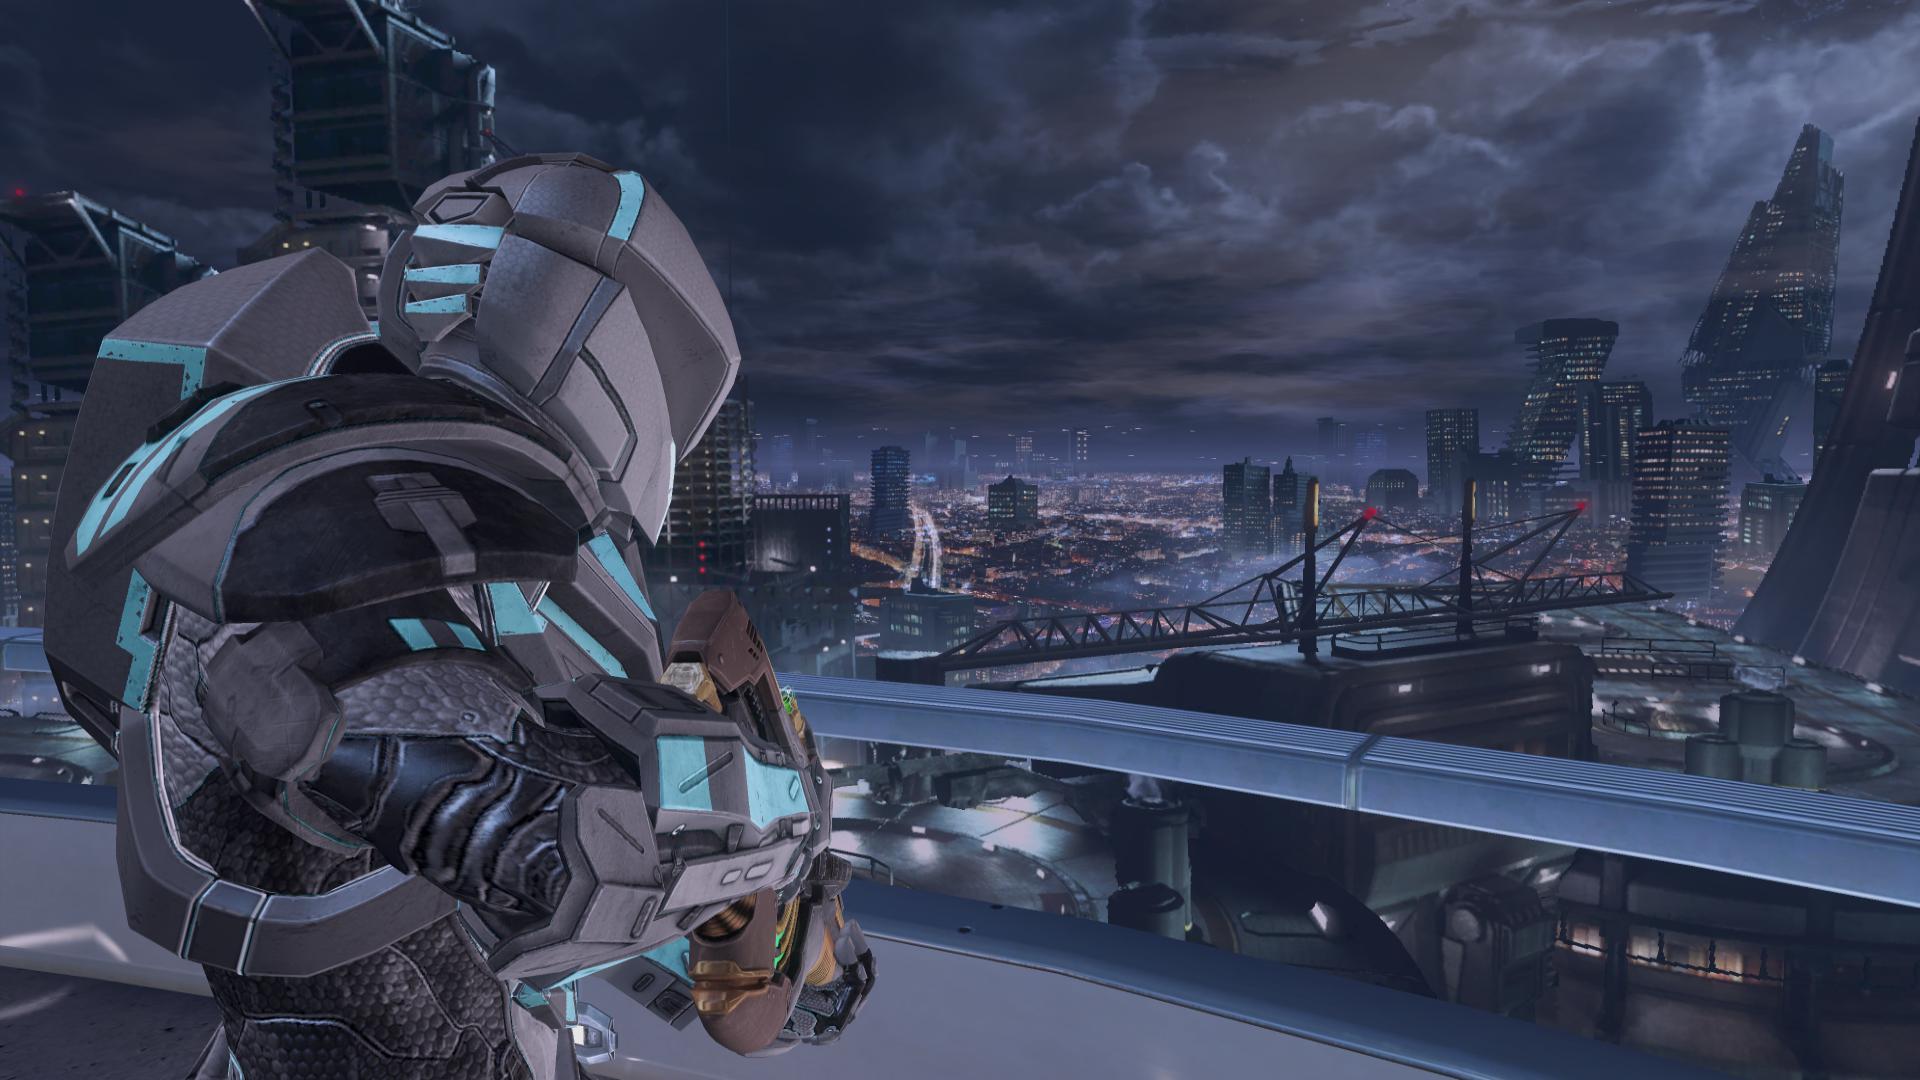 Halo 4 screenshots. image - Exavile - Mod DB